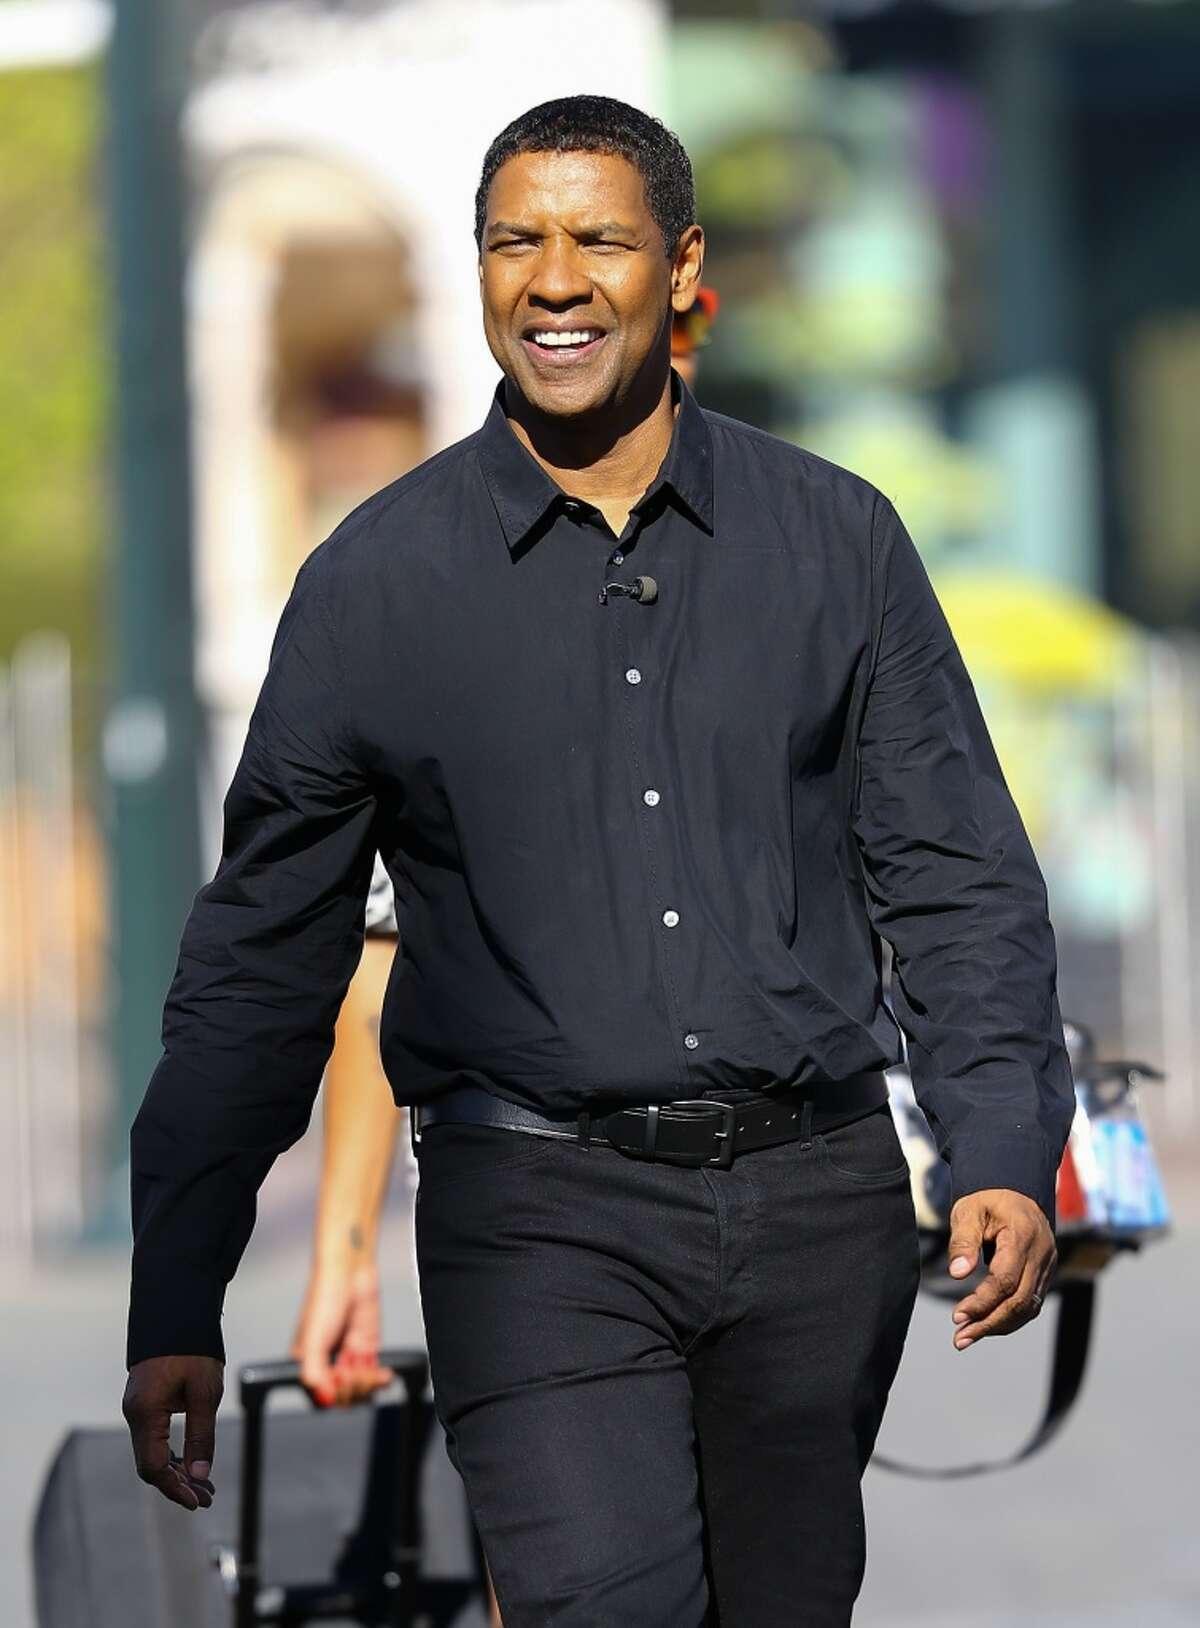 2. Denzel Washington Returned $6.50 per every dollar paid